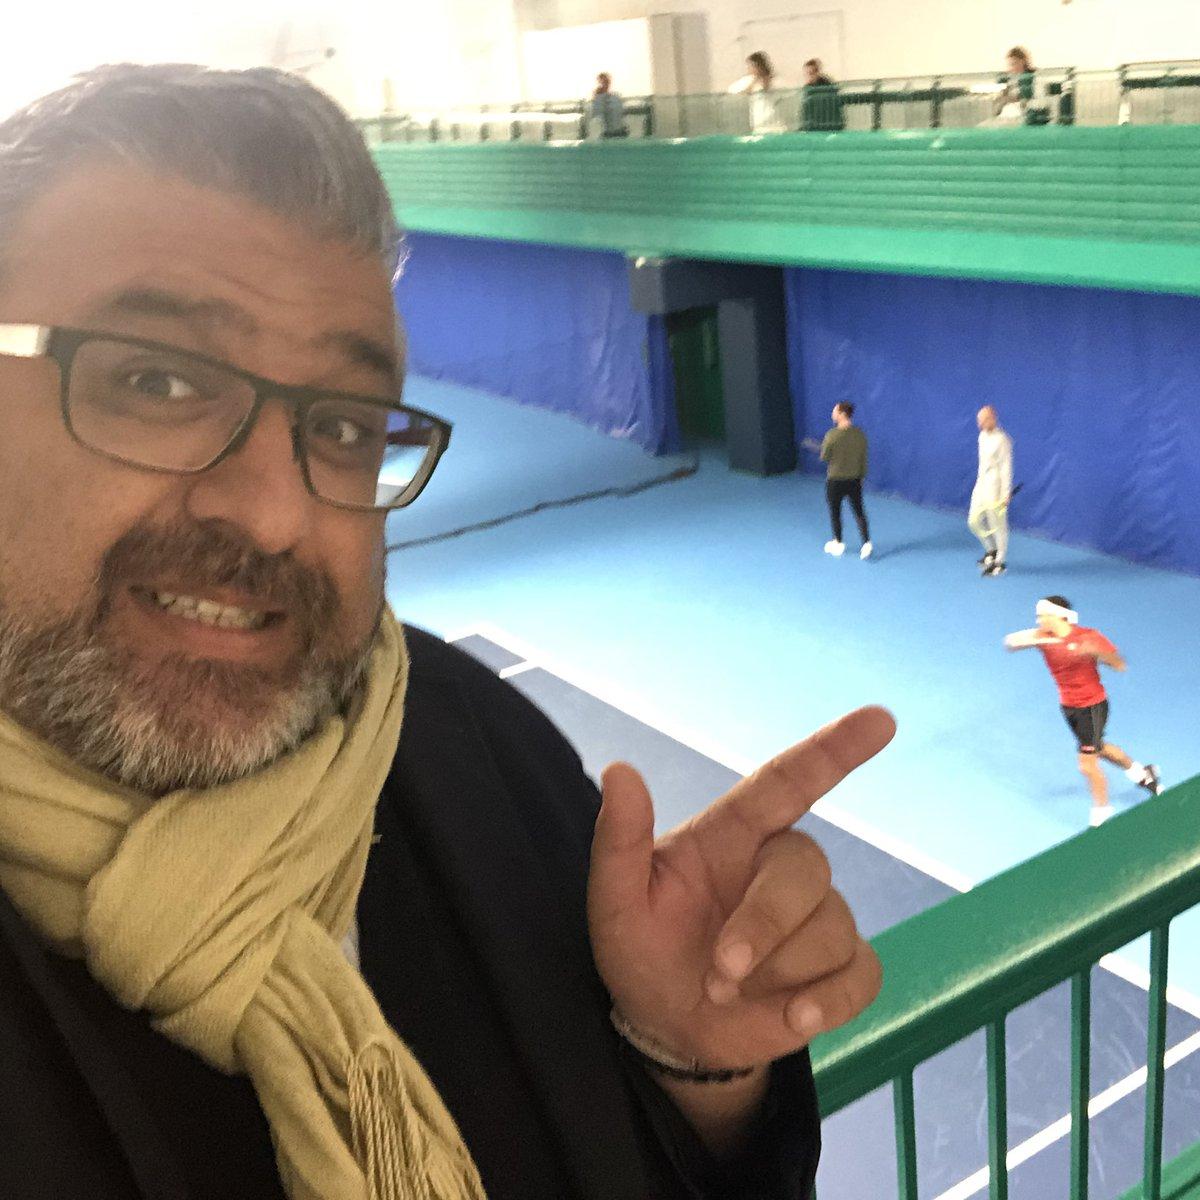 When @rogerfederer pops in to play @TheQueensClub @atptour @SABOURETCardio @fischman_david @ajaykirtane @drkogallagher @QueensTennis @rahatheart1 @DrMarthaGulati @HeartOTXHeartMD @drandrewsharp @AnastasiaSMihai @DrPascalMeier @CMichaelGibson #tennis<br>http://pic.twitter.com/9zsmdXDfF0